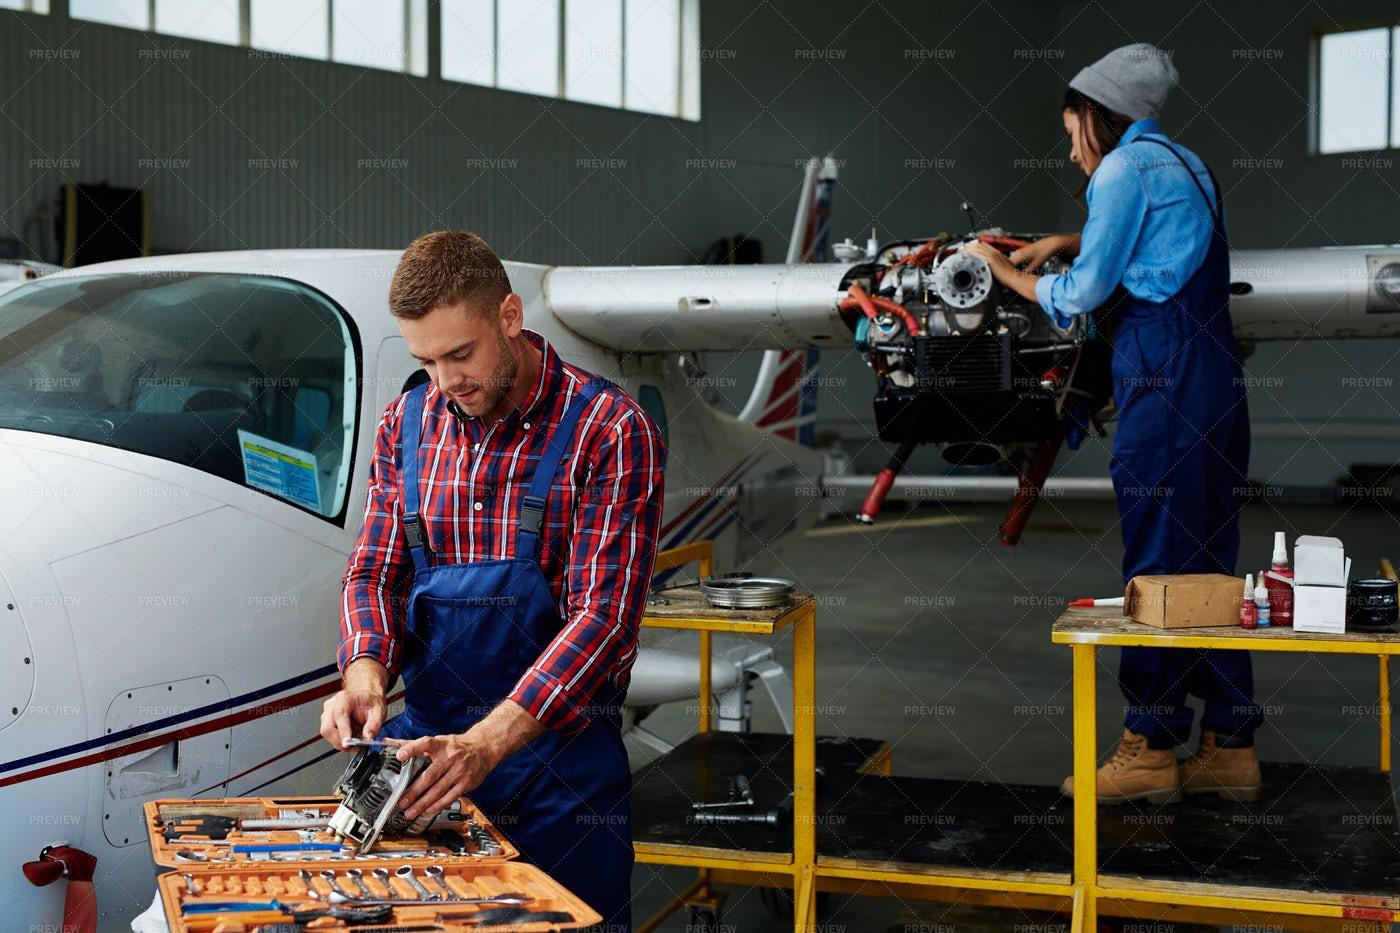 Engineers Repairing Airplane Turbine: Stock Photos